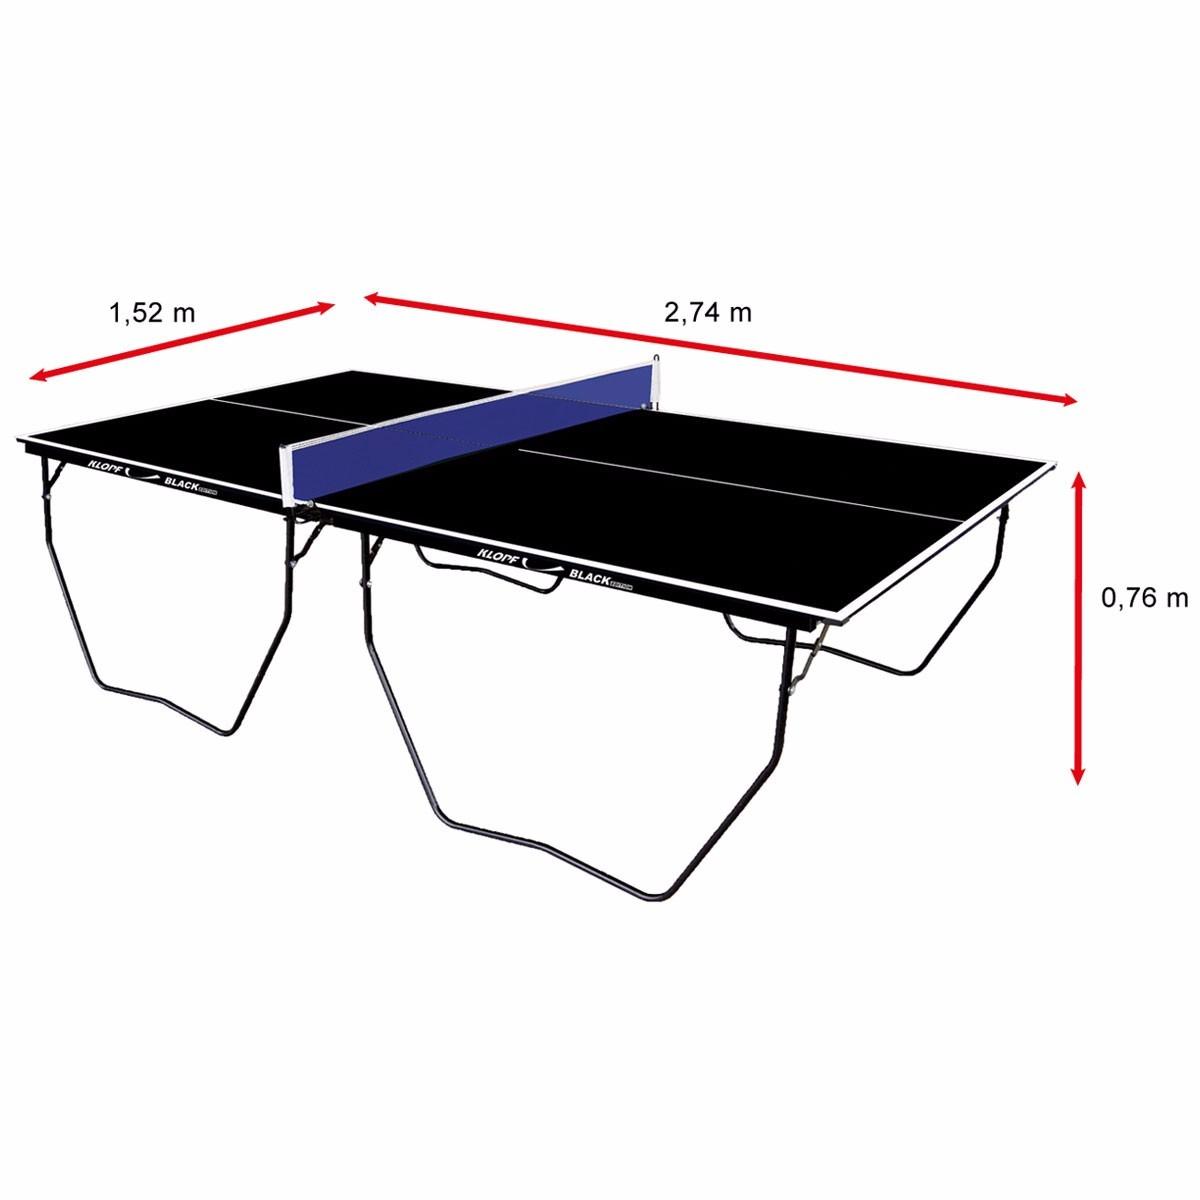 Mesa ping pong tenis de mesa oficial 15mm black klopf 1087 r 986 90 em mercado livre - Mesas de pinpon ...